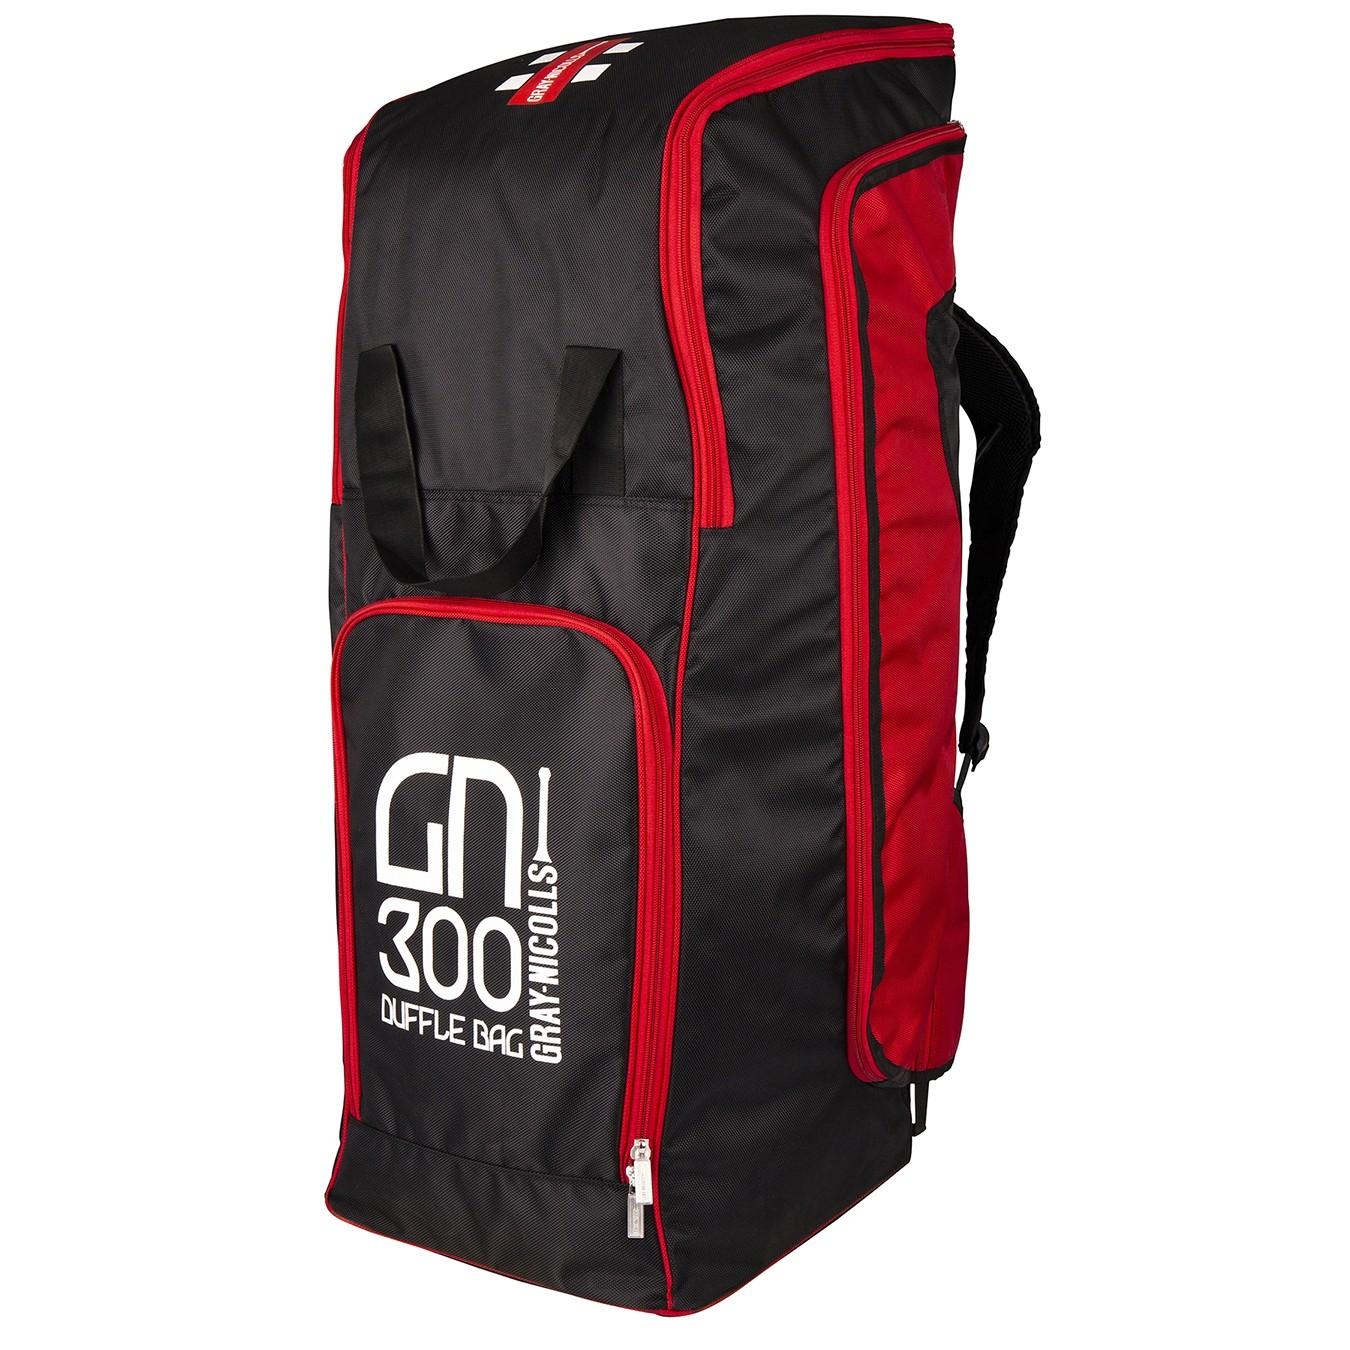 2020 Gray Nicolls GN 300 Duffle Cricket Bag - Black & Red